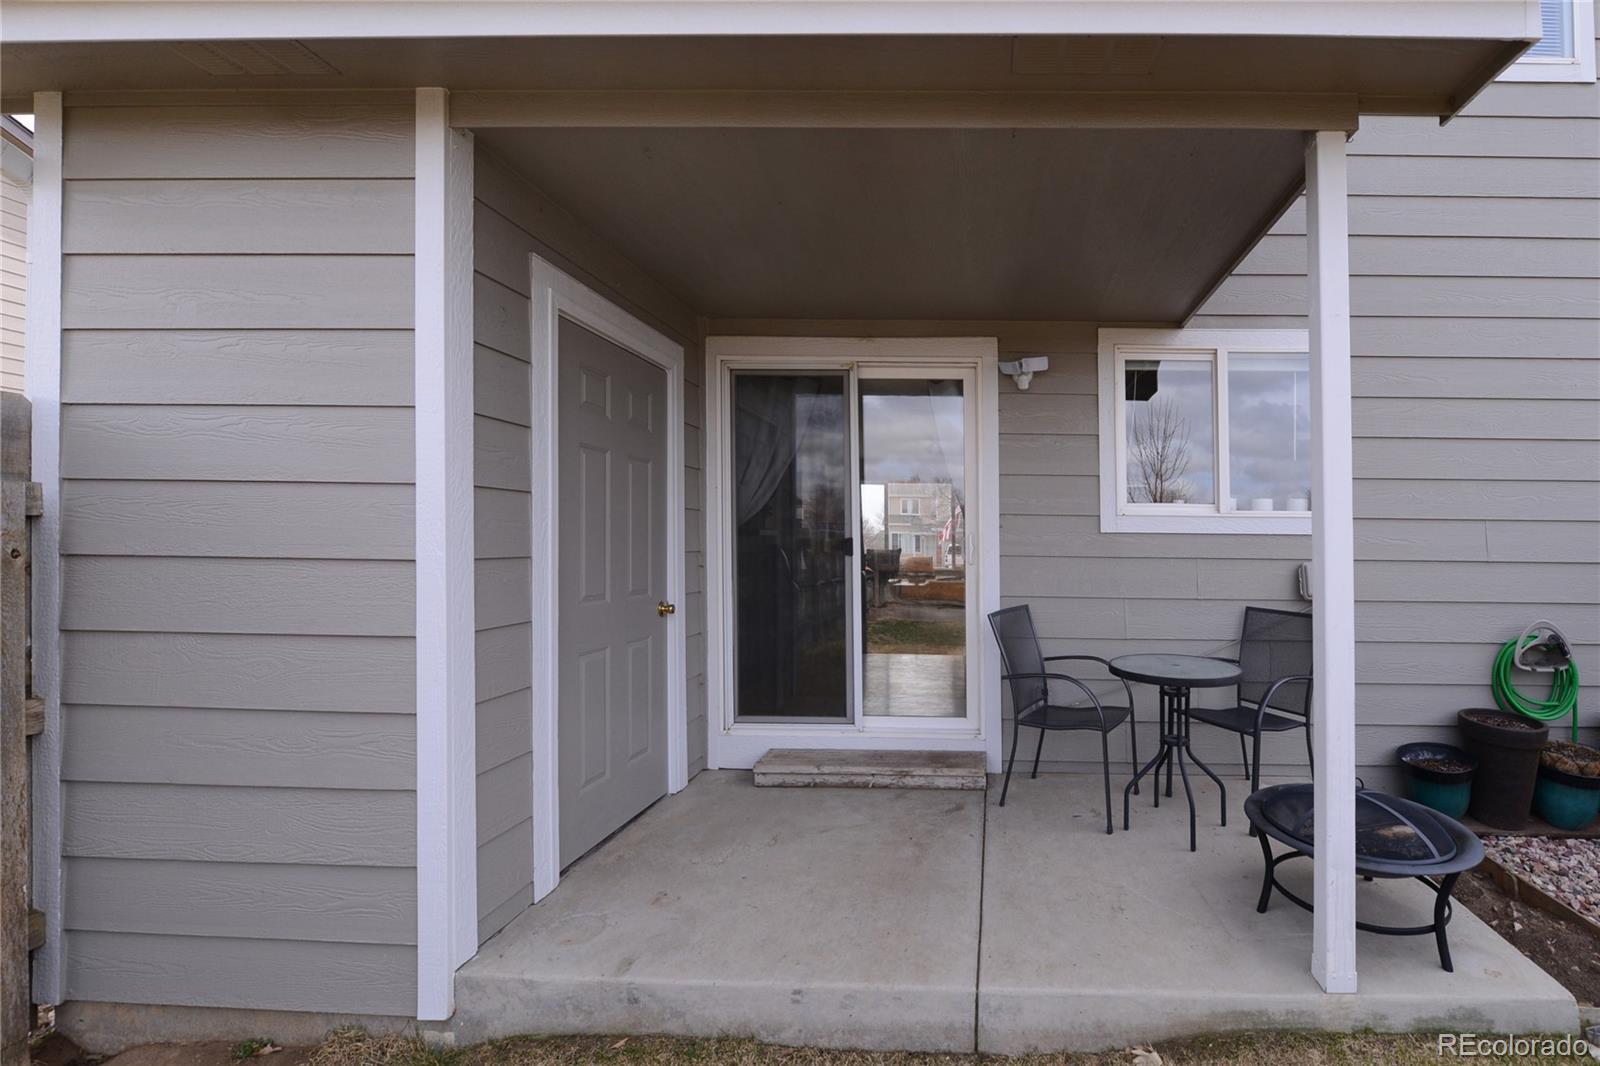 MLS# 2748103 - 22 - 3121 Swan Point Drive, Evans, CO 80620